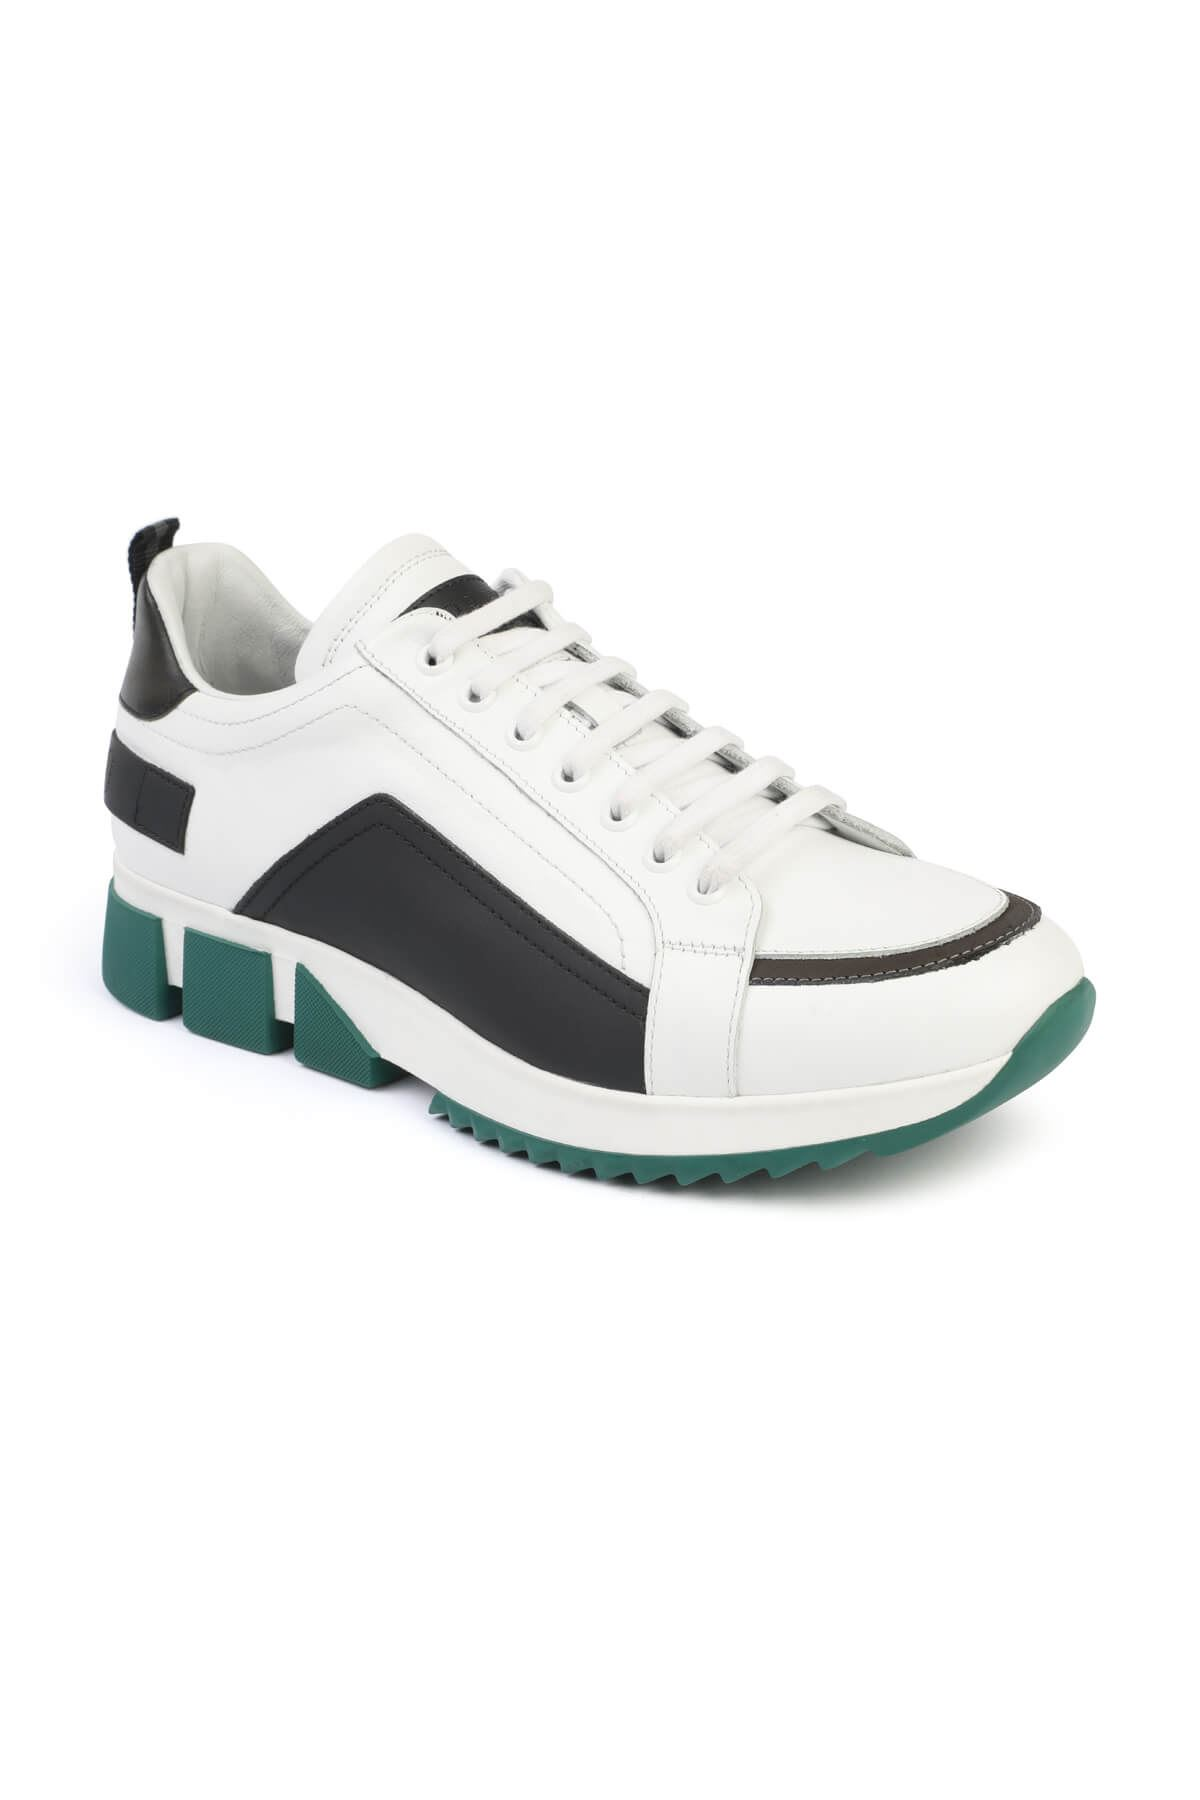 Libero 3133 White Green Sport Shoes